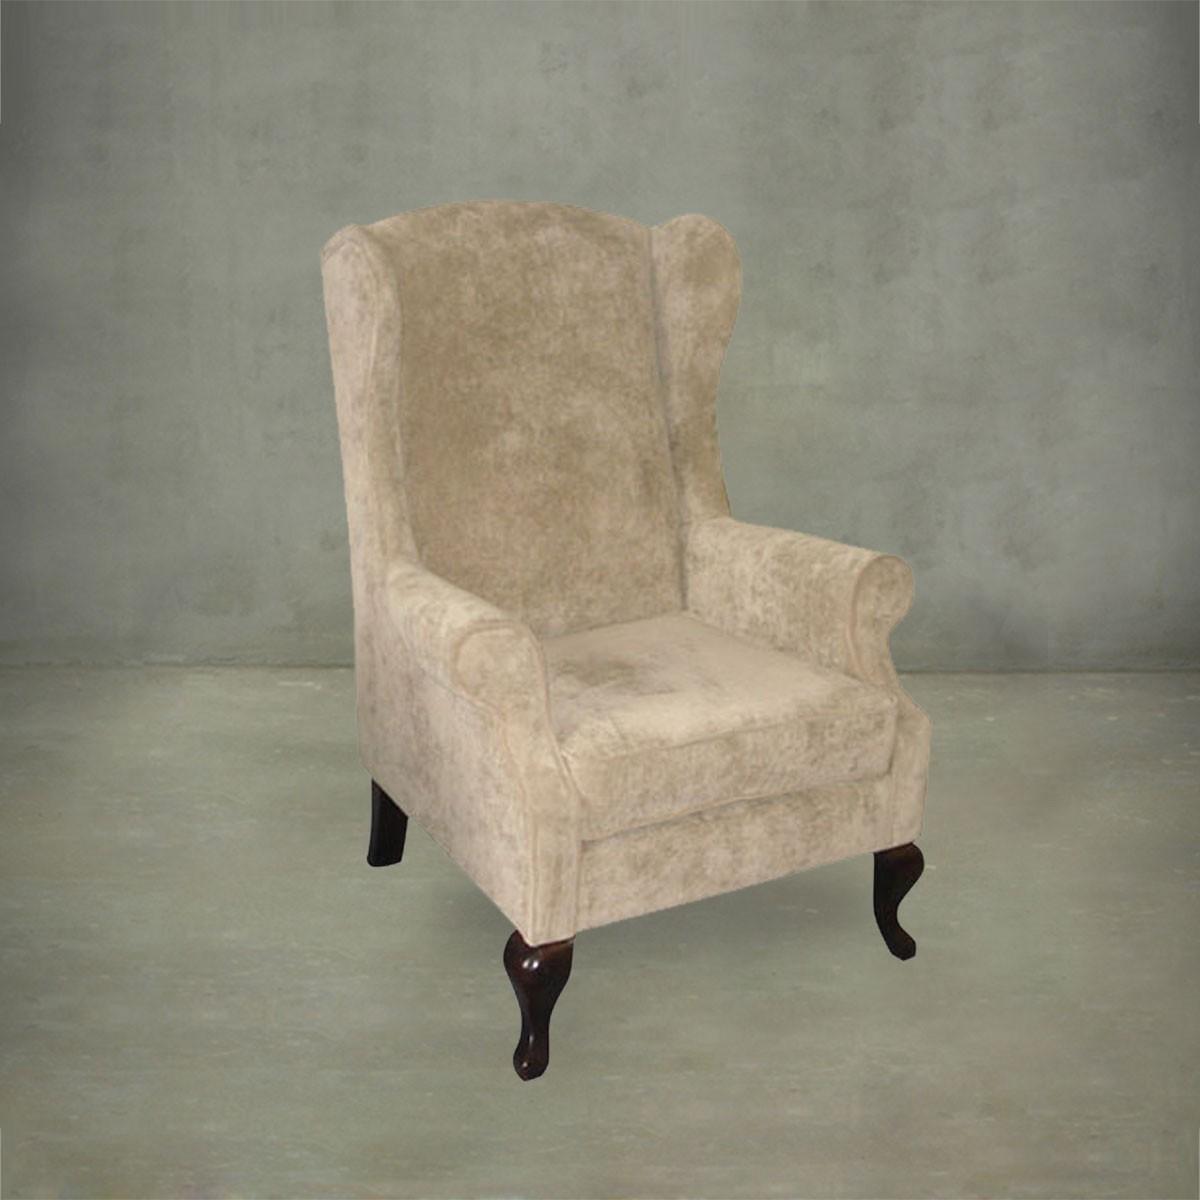 fauteuil club de wingback avec accoudoirs pjs26501 decoraport canada. Black Bedroom Furniture Sets. Home Design Ideas